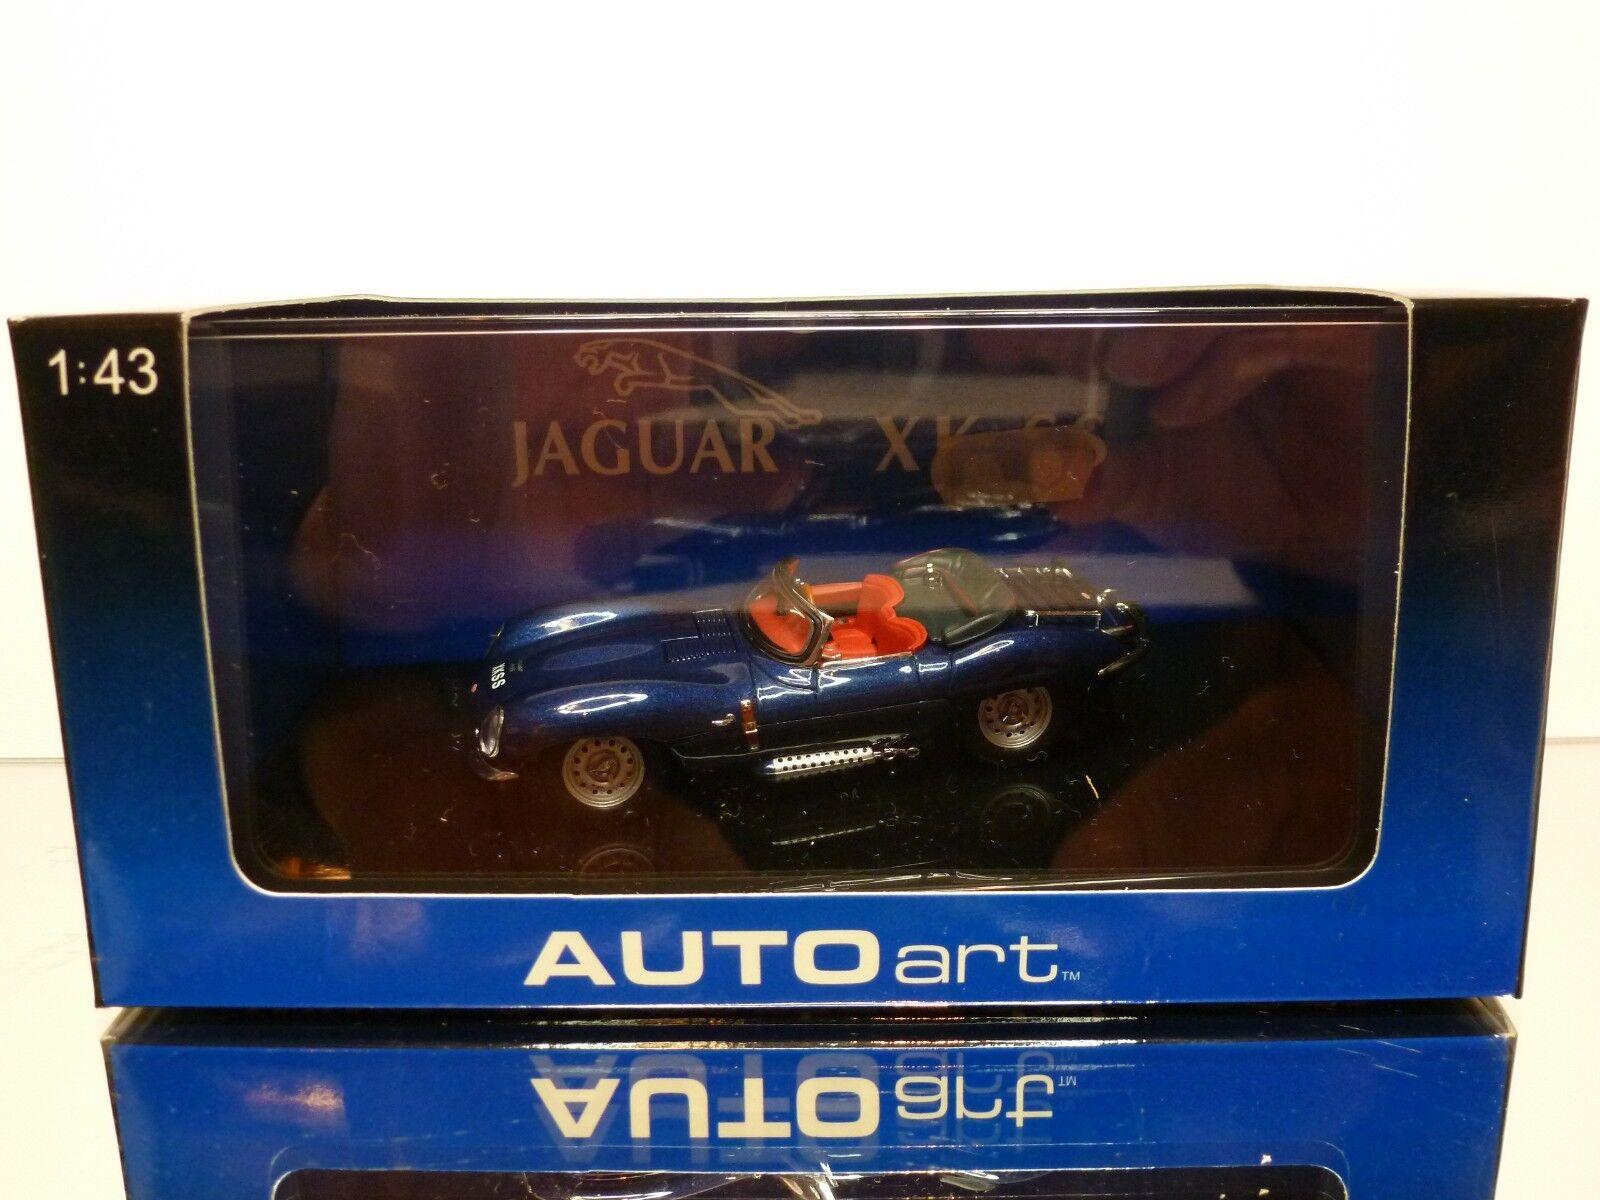 AUTOART 53751 JAGUAR XK SS - blu METALLIC 1 43 - EXCELLENT IN BOX